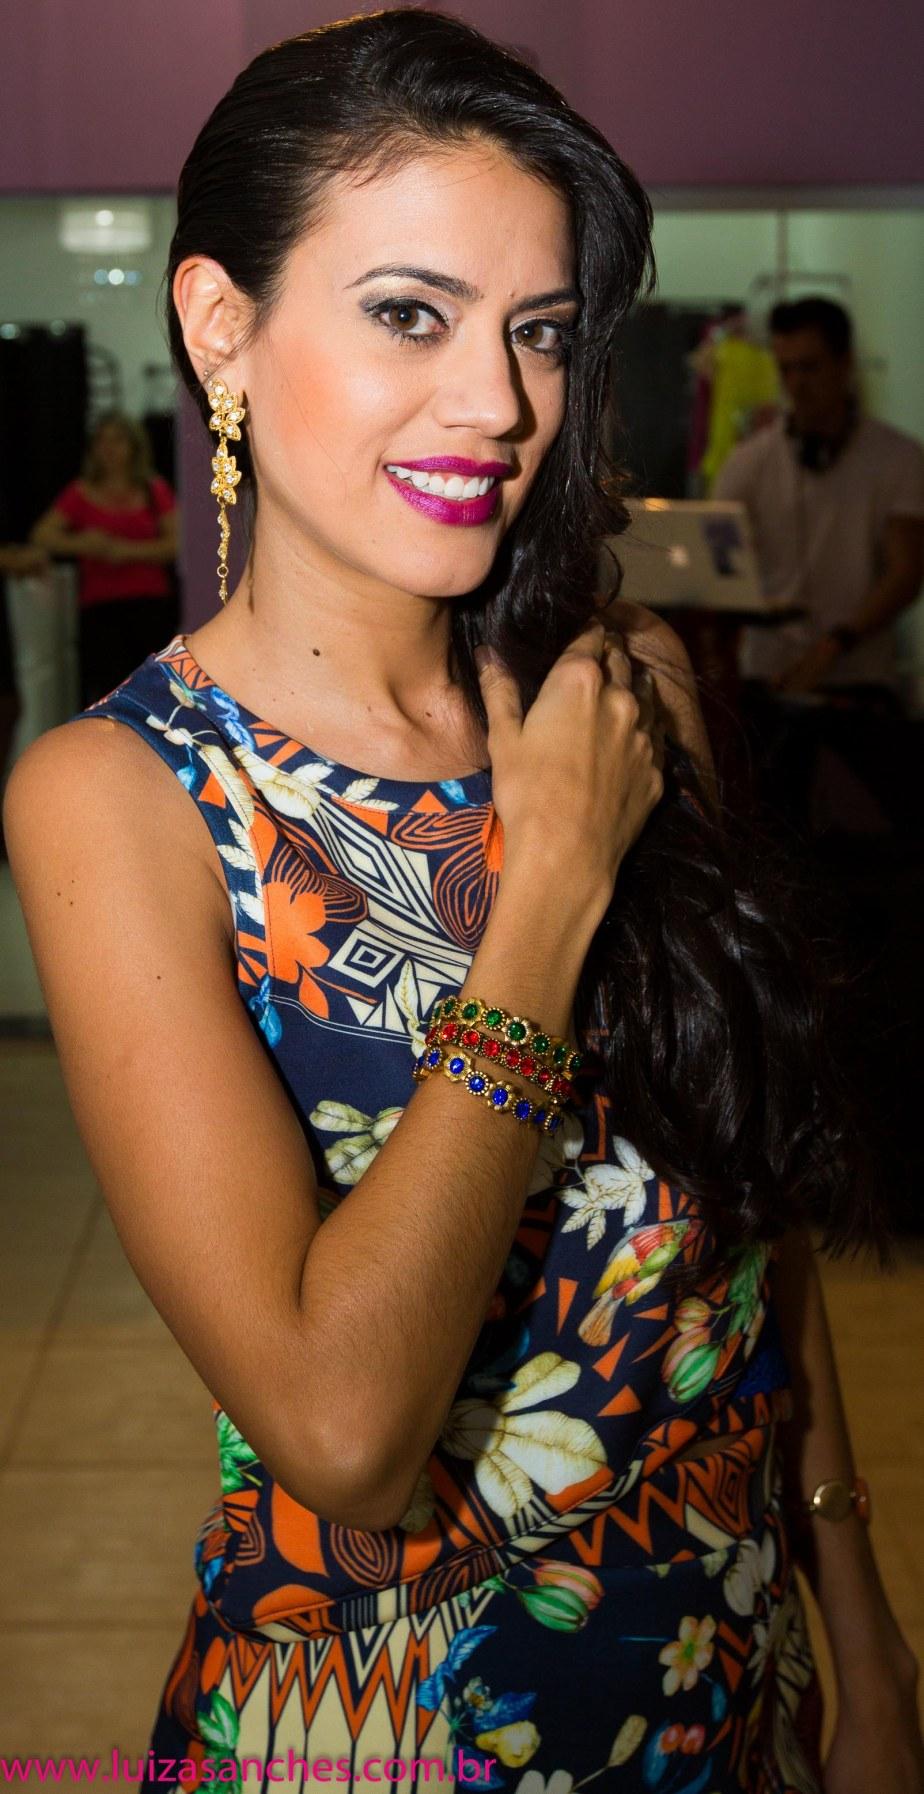 Blog da Luiza Sanches 1-11